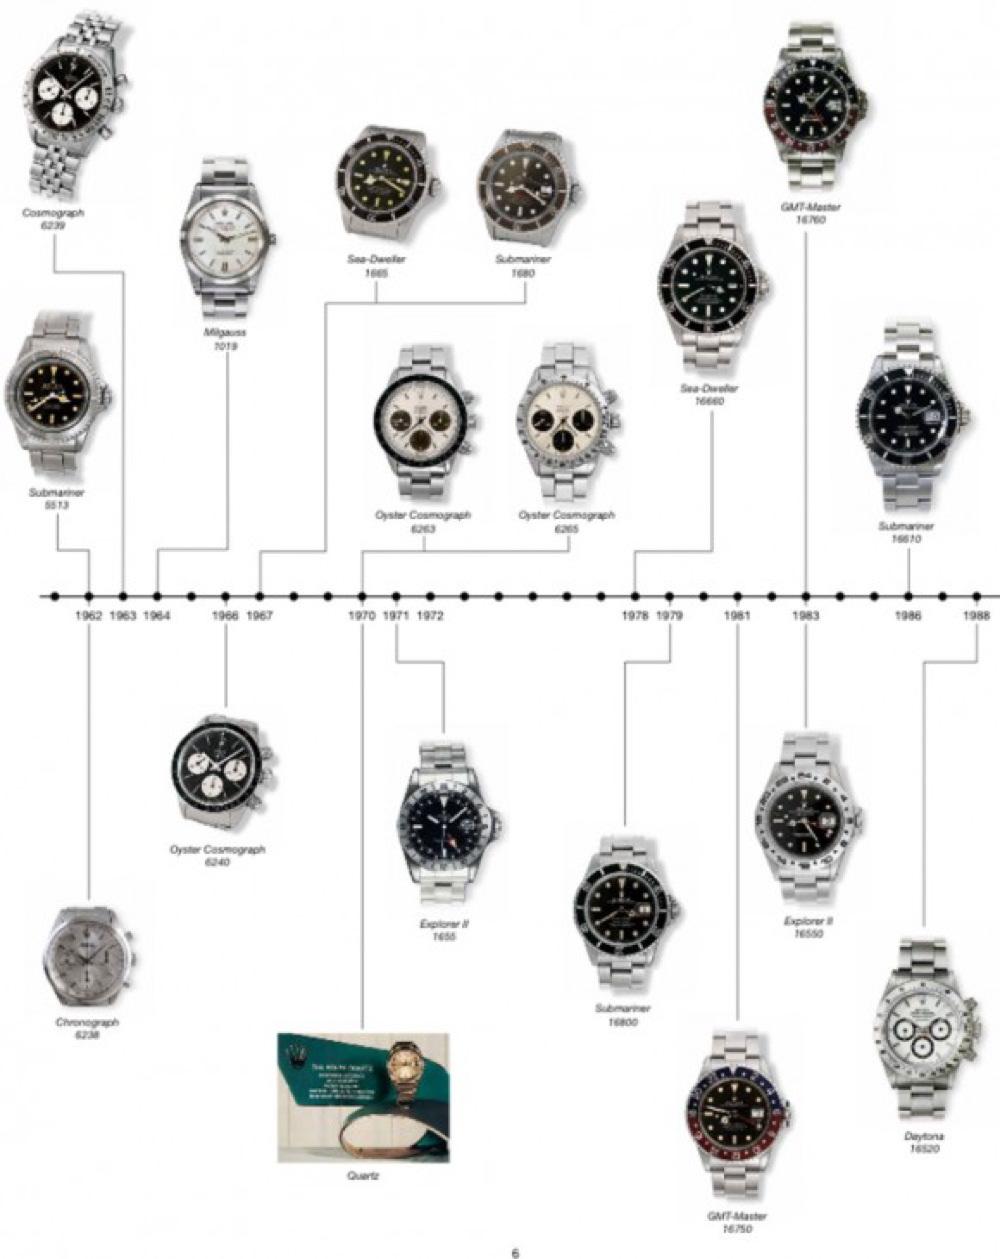 RPR_Rolex_History_3-580x730